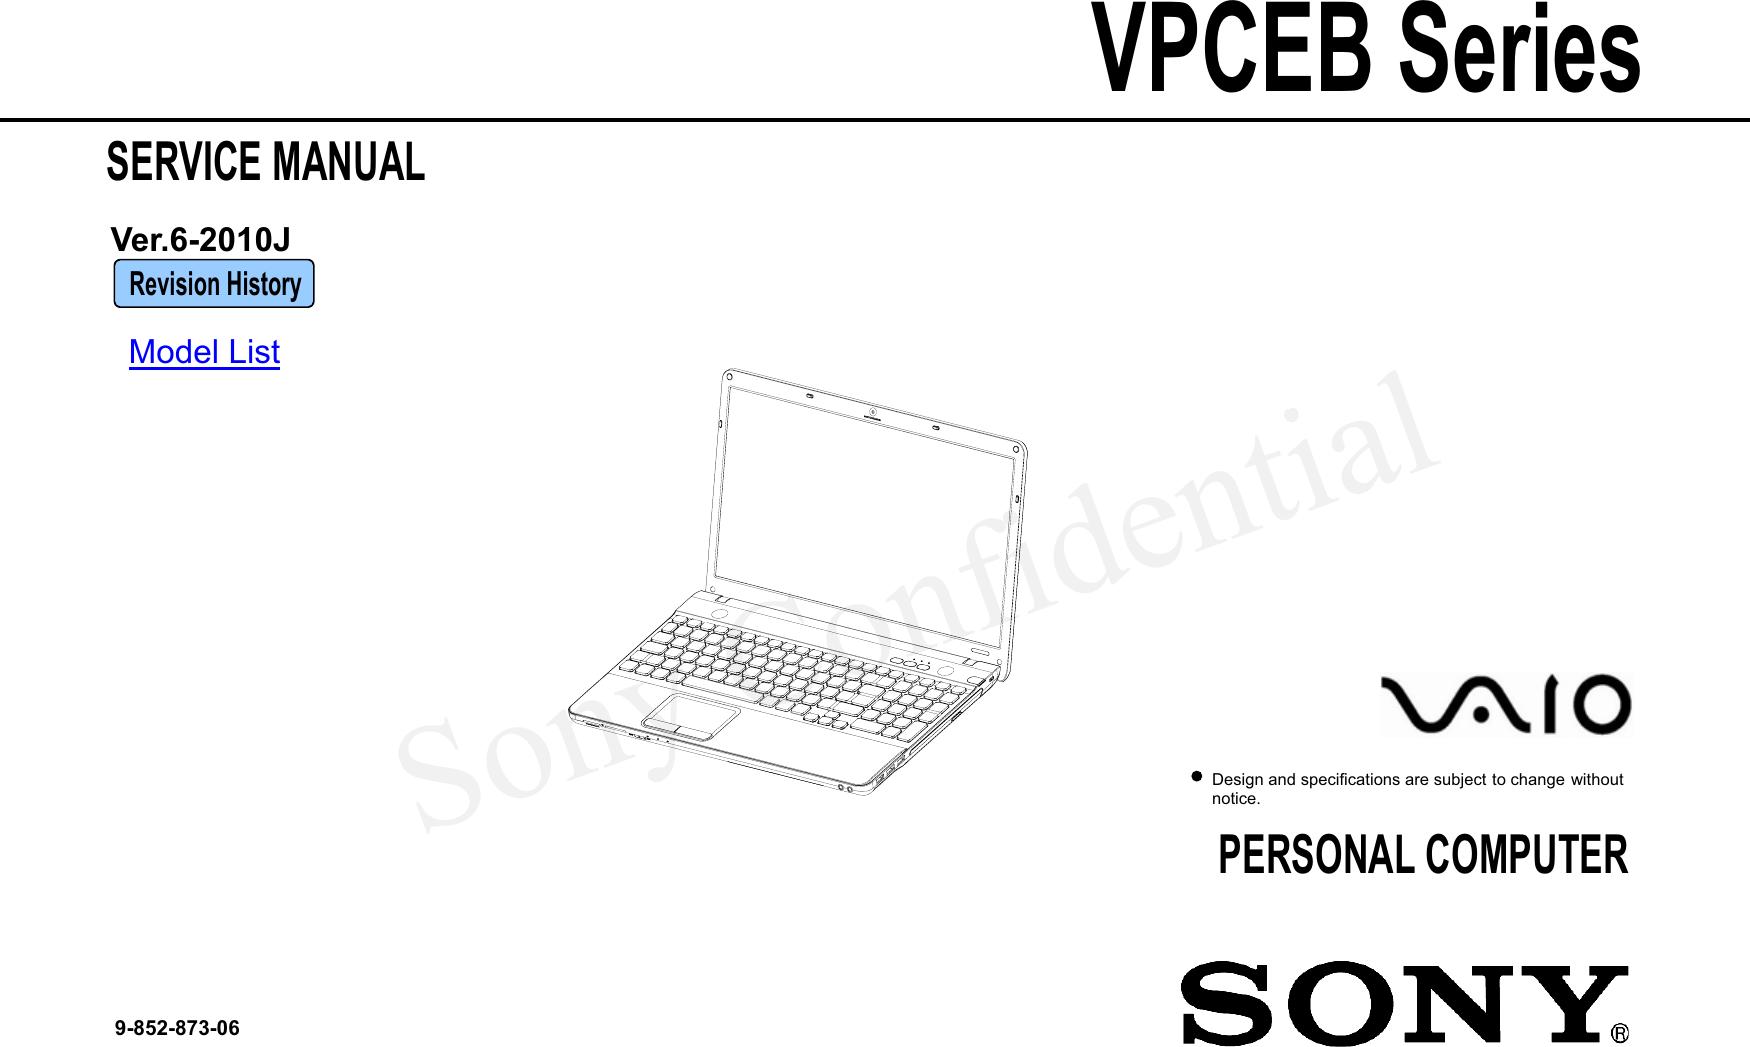 Sony Vpceb Users Manual M970 Service Manual20101012 Vaio Parts Diagram